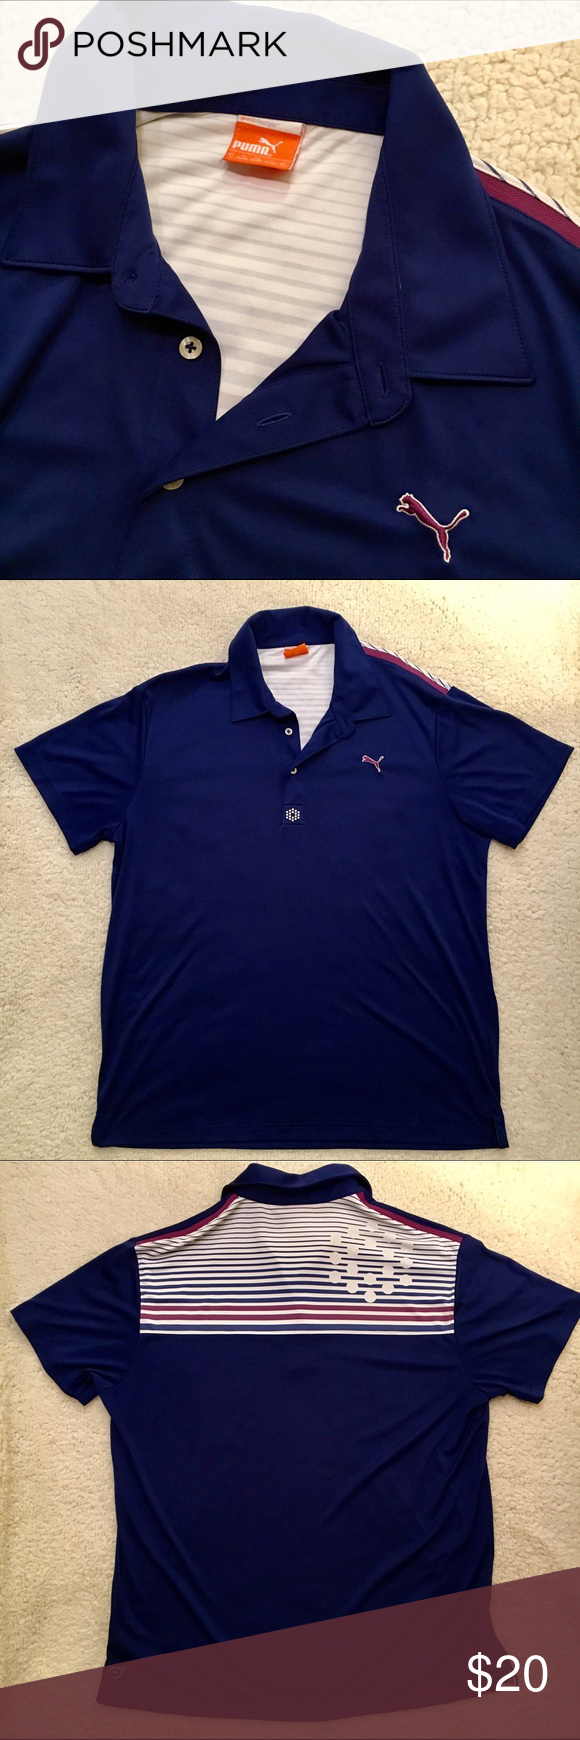 Puma Golf Sportlifestyle Polo Shirt Puma Golf Sportlifestyle mens dry-cell polo shirt. Used but great condition. Size large. 🏌️ Puma Shirts Polos